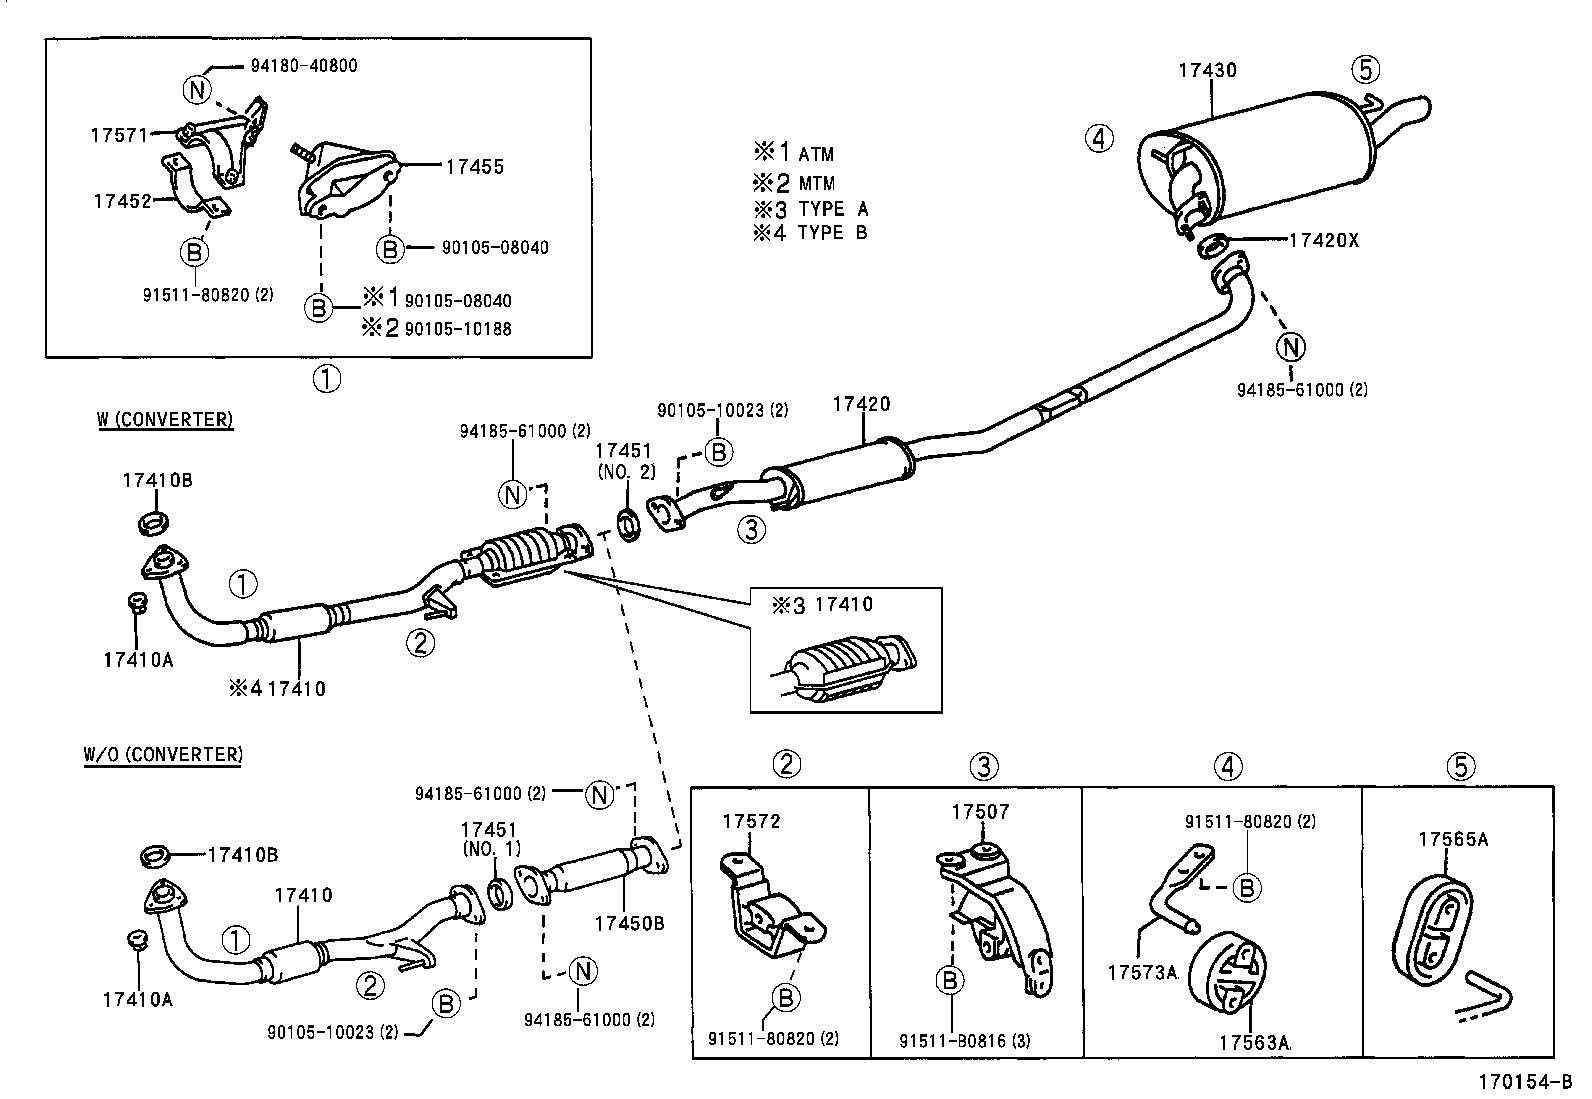 Toyota Camrysxv20l-aepnkw - Tool-engine-fuel